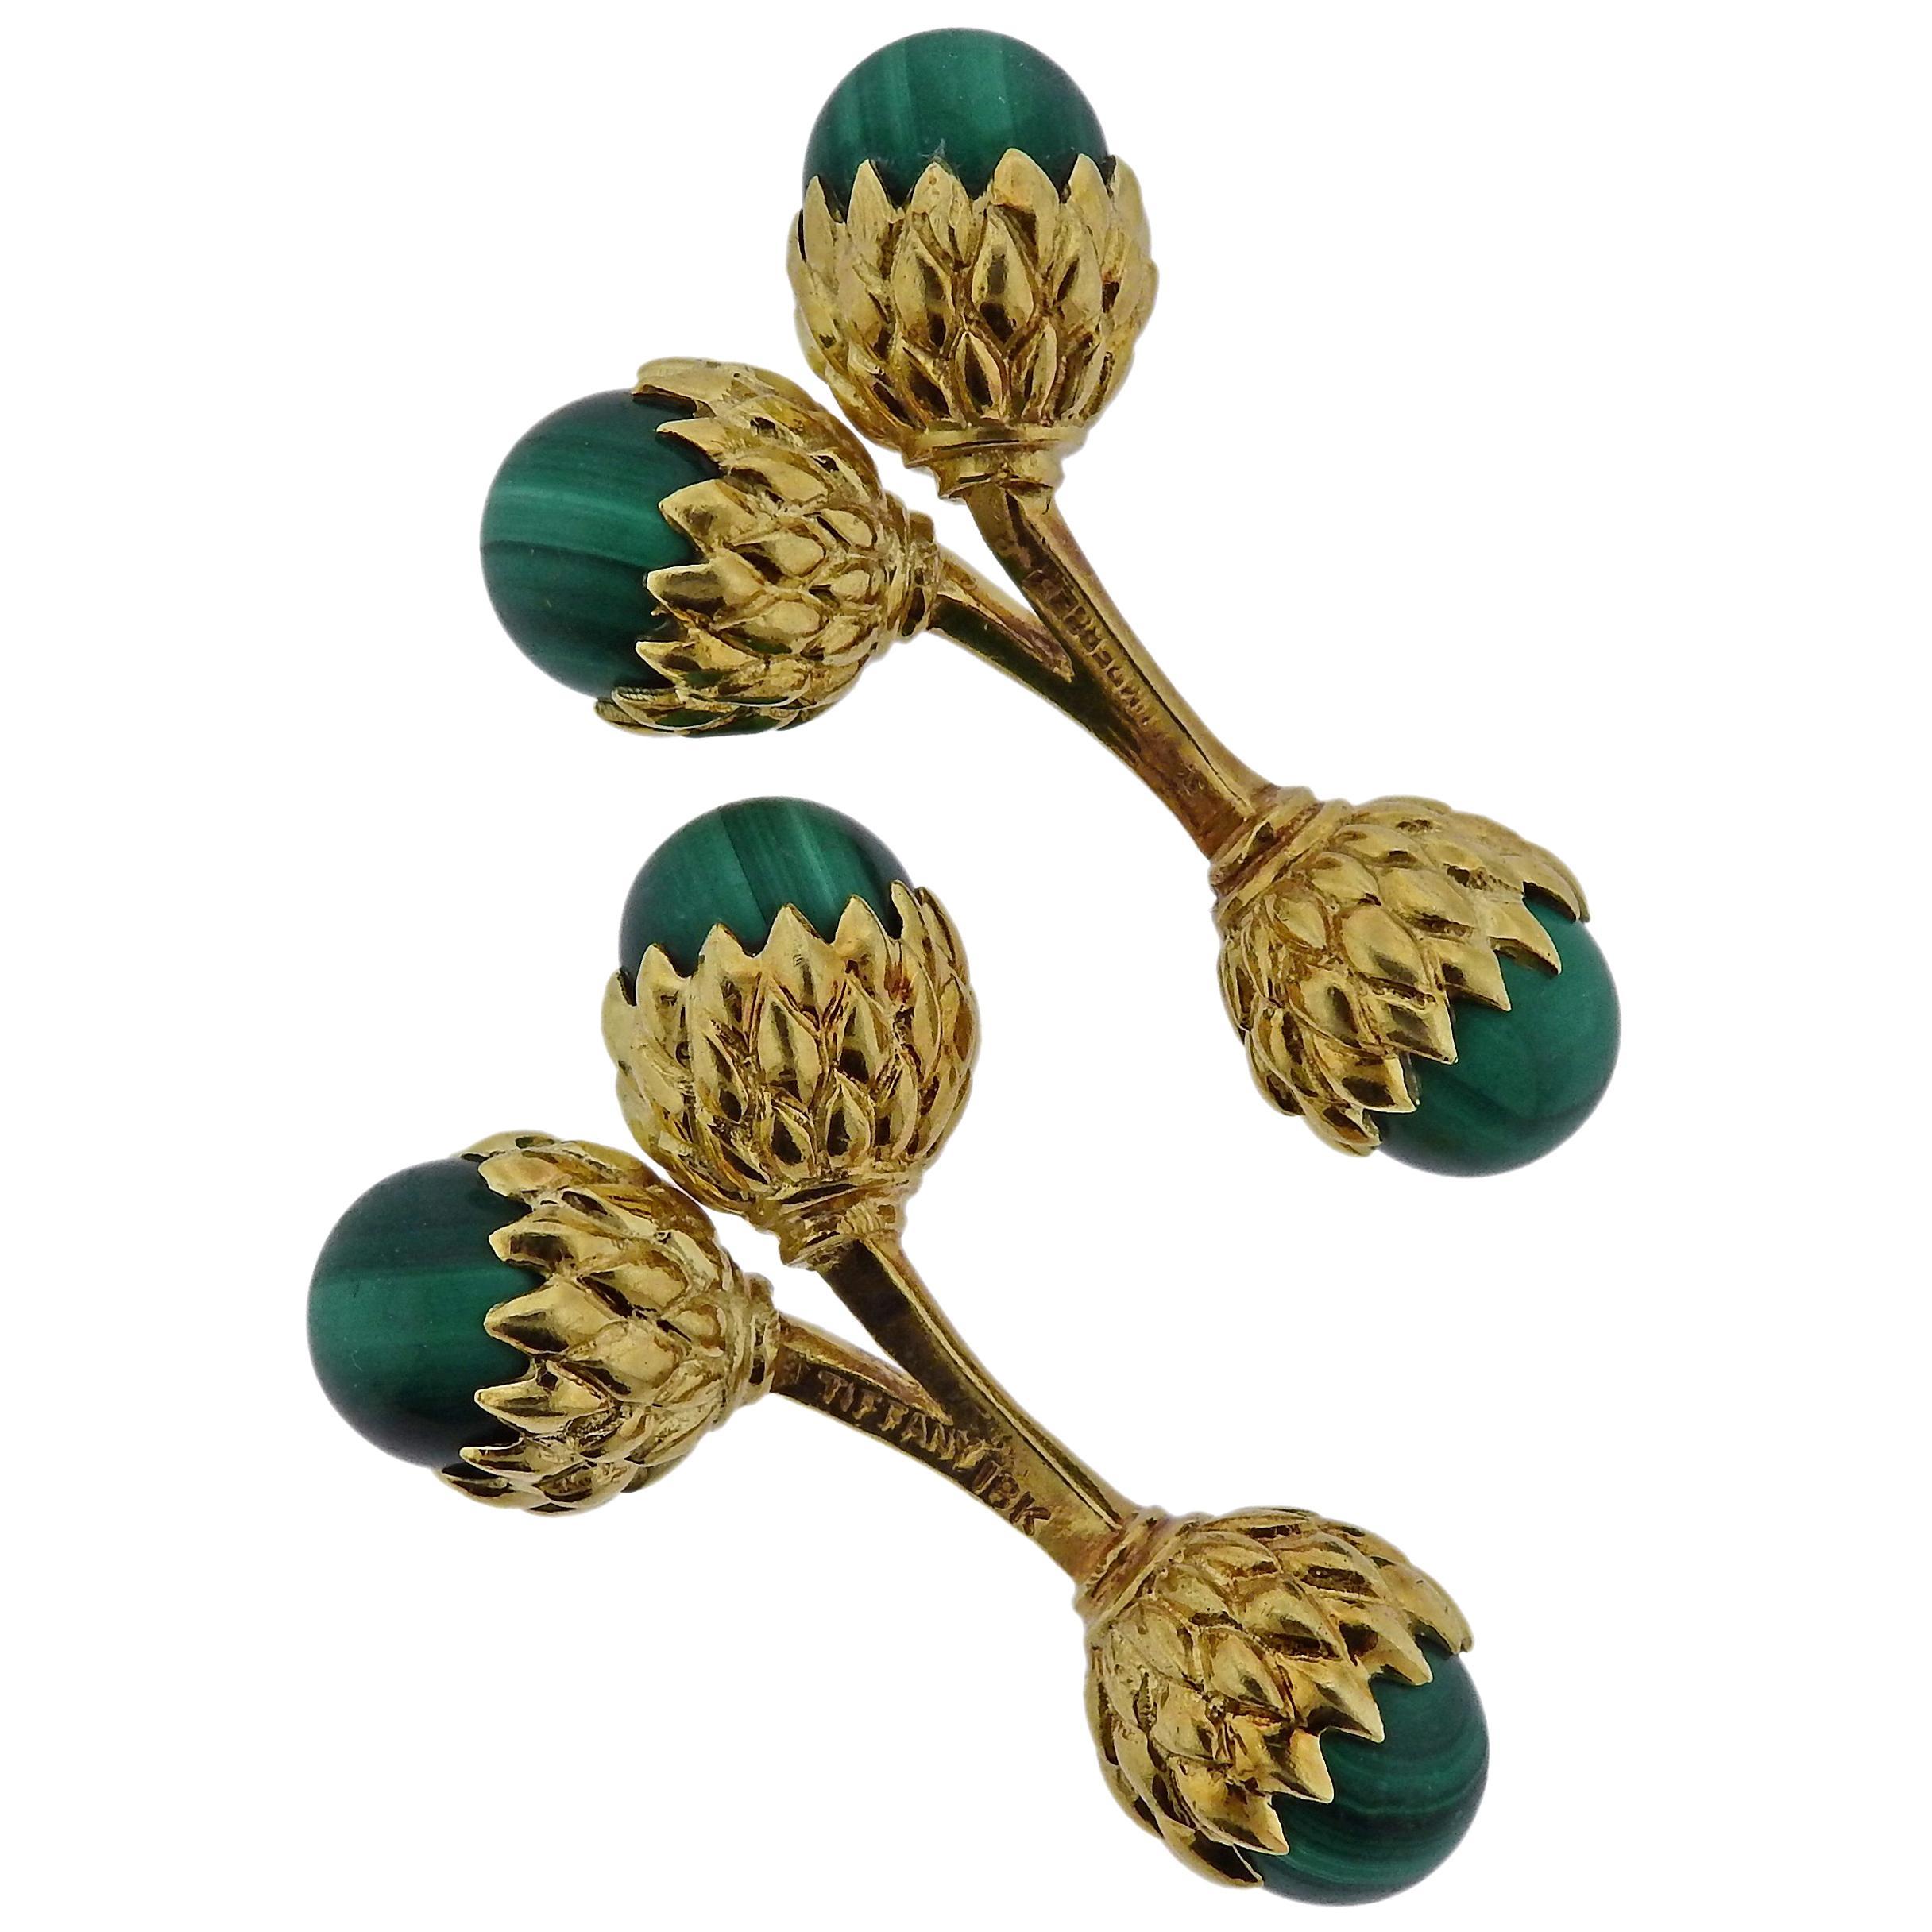 Tiffany & Co. Schlumberger Malachite Gold Acorn Cufflinks